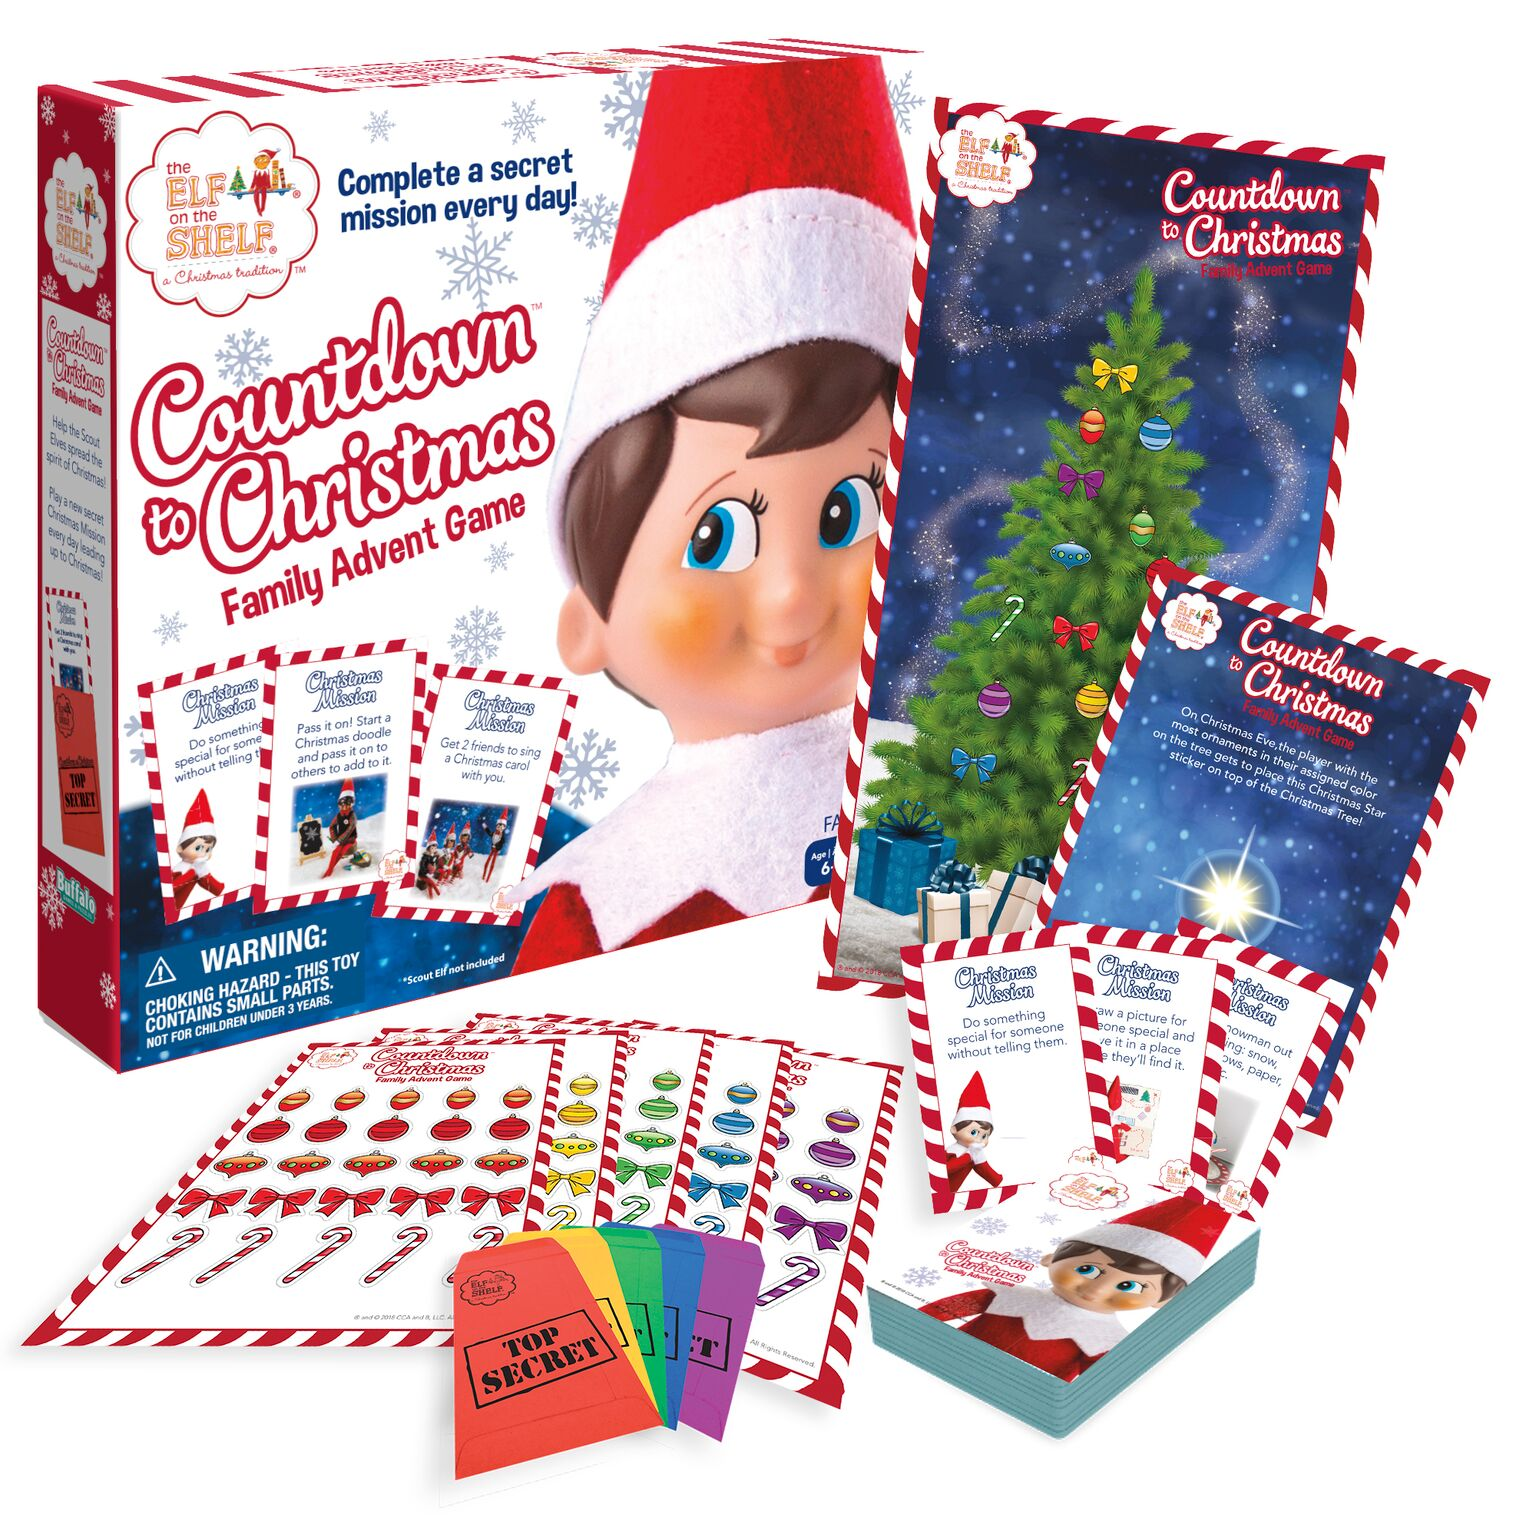 Elf on the Shelf - Countdown to Christmas